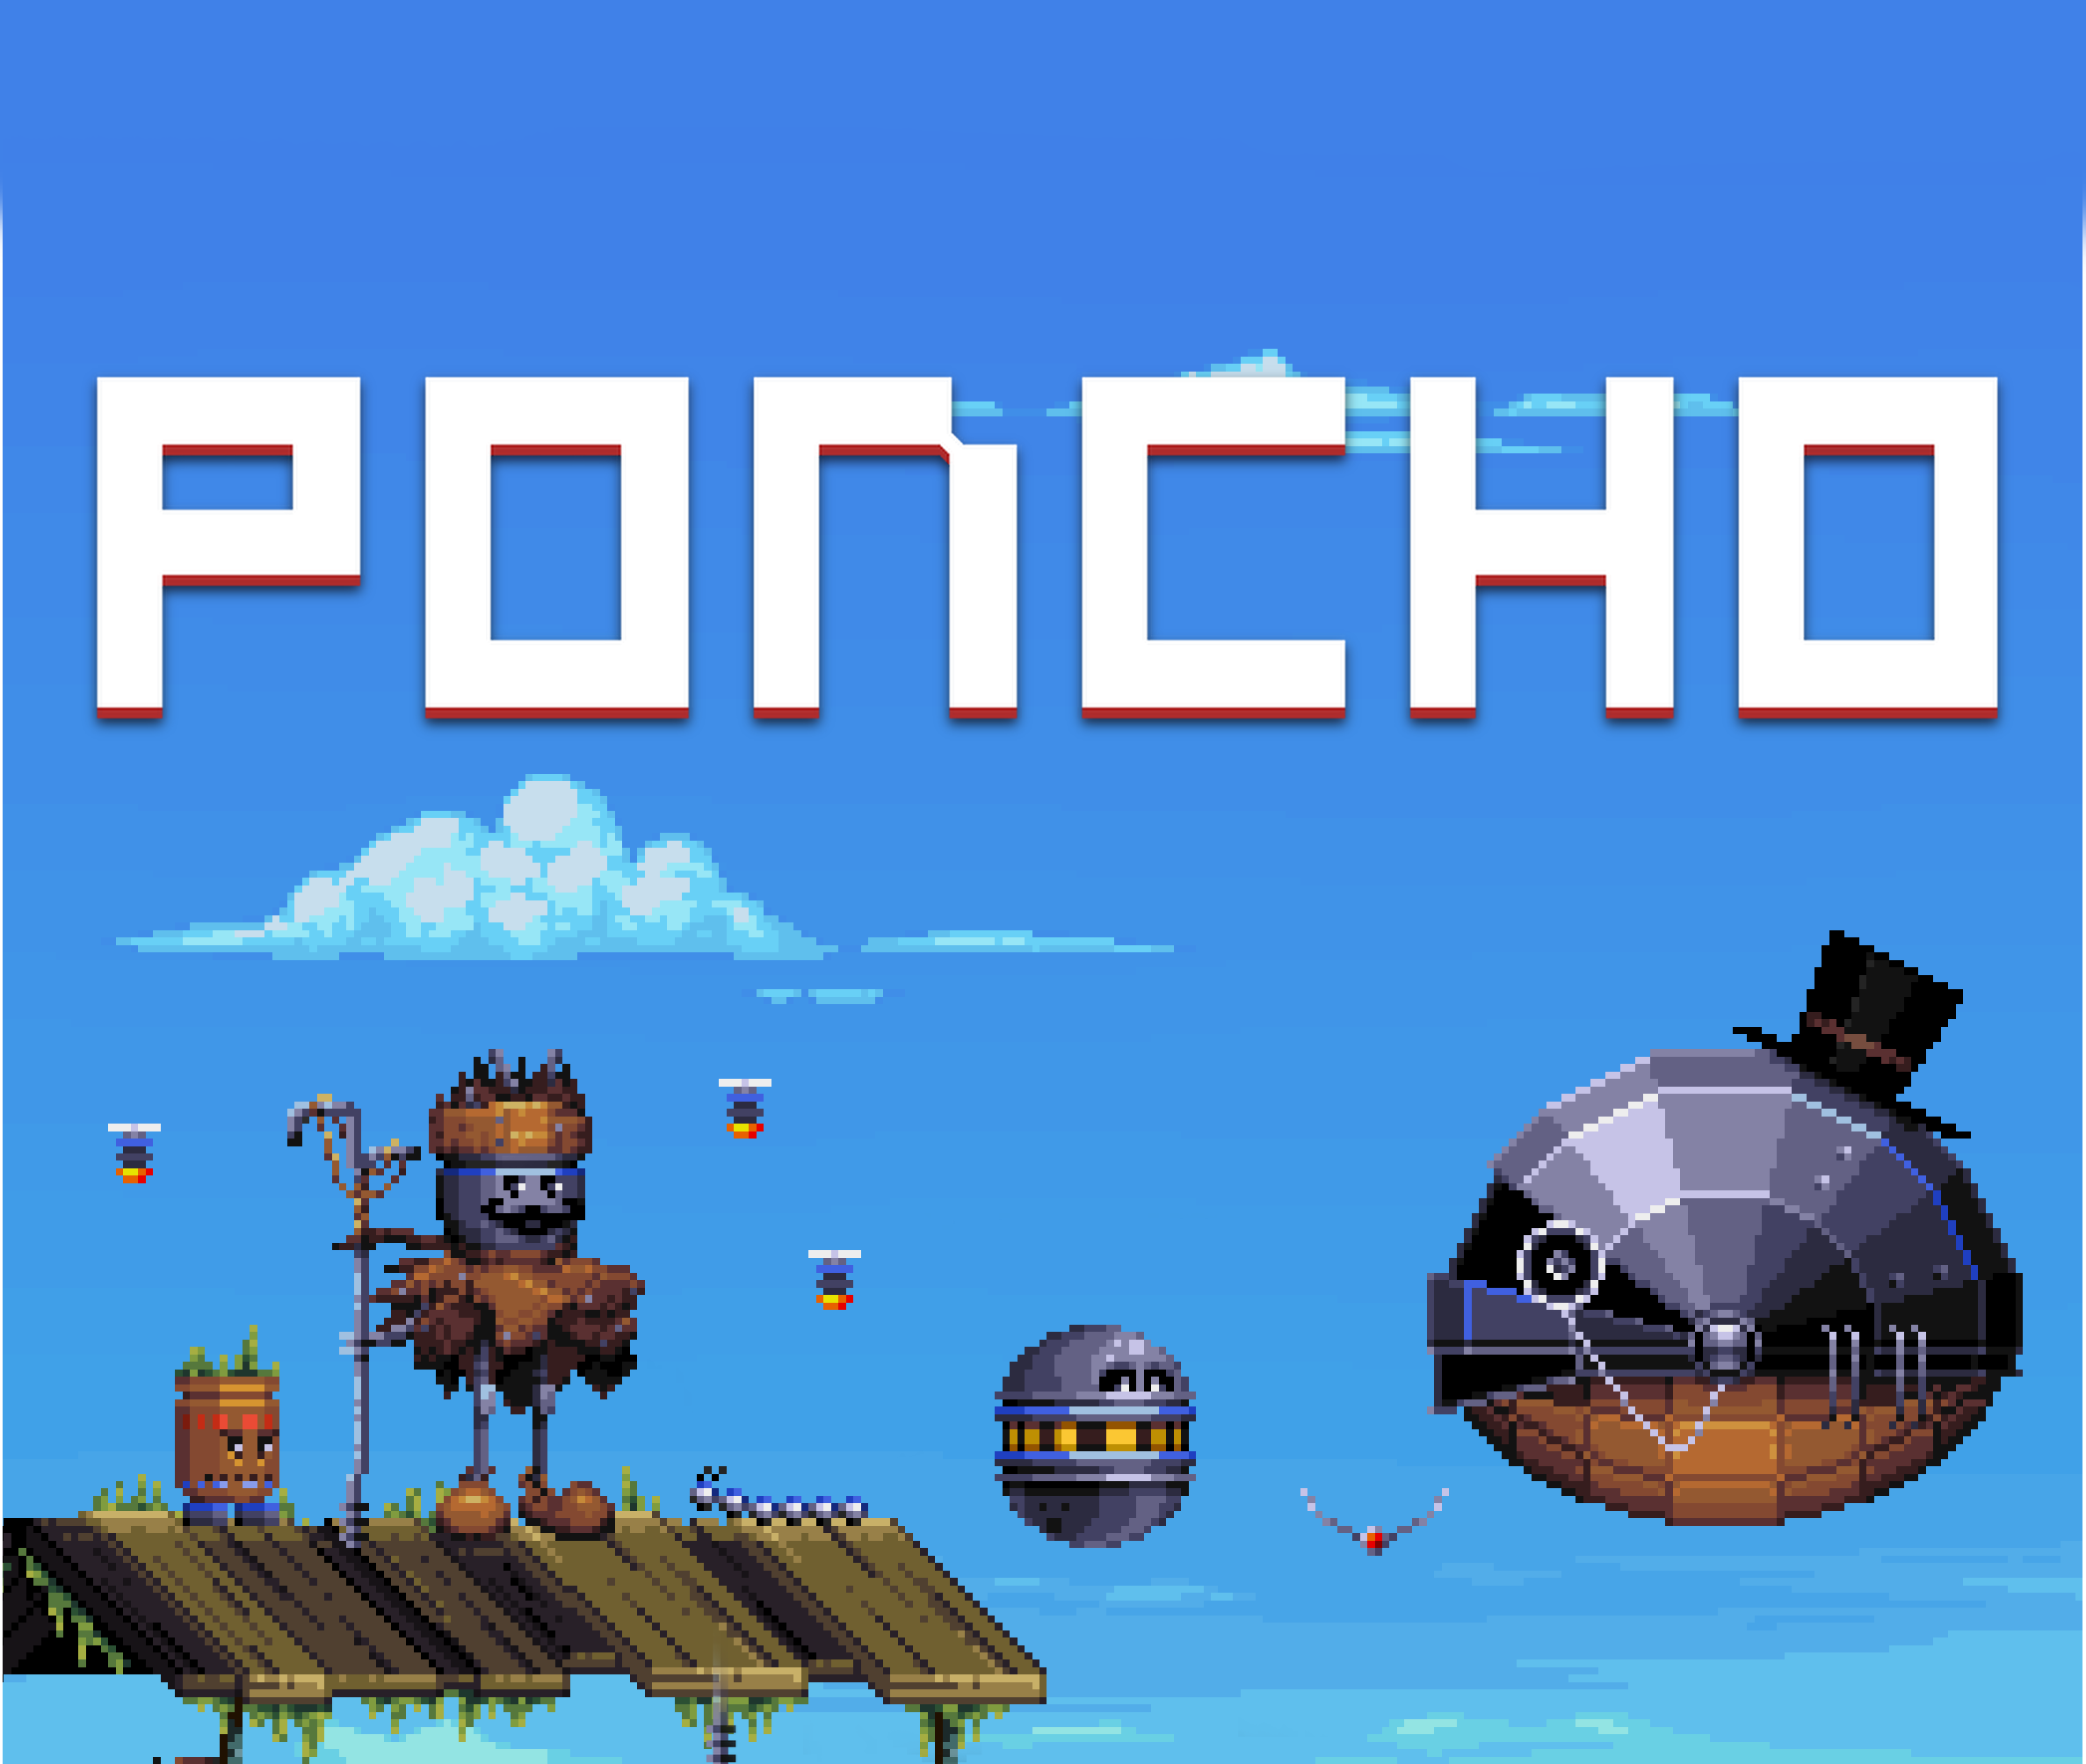 Poncho 2 5D pixel art adventure platformer debuts on Linux